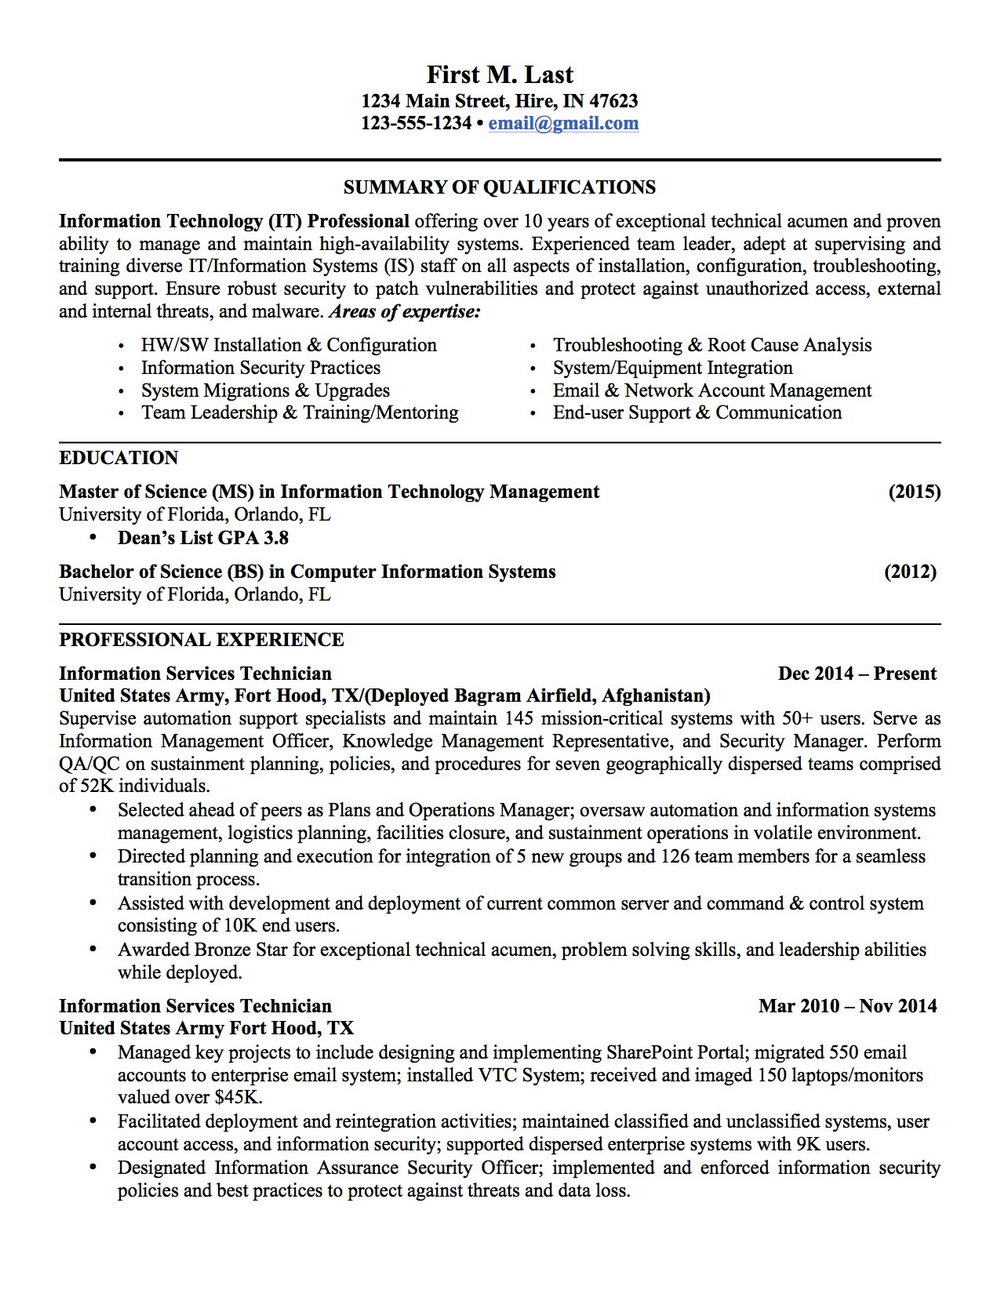 Military Resume To Civilian